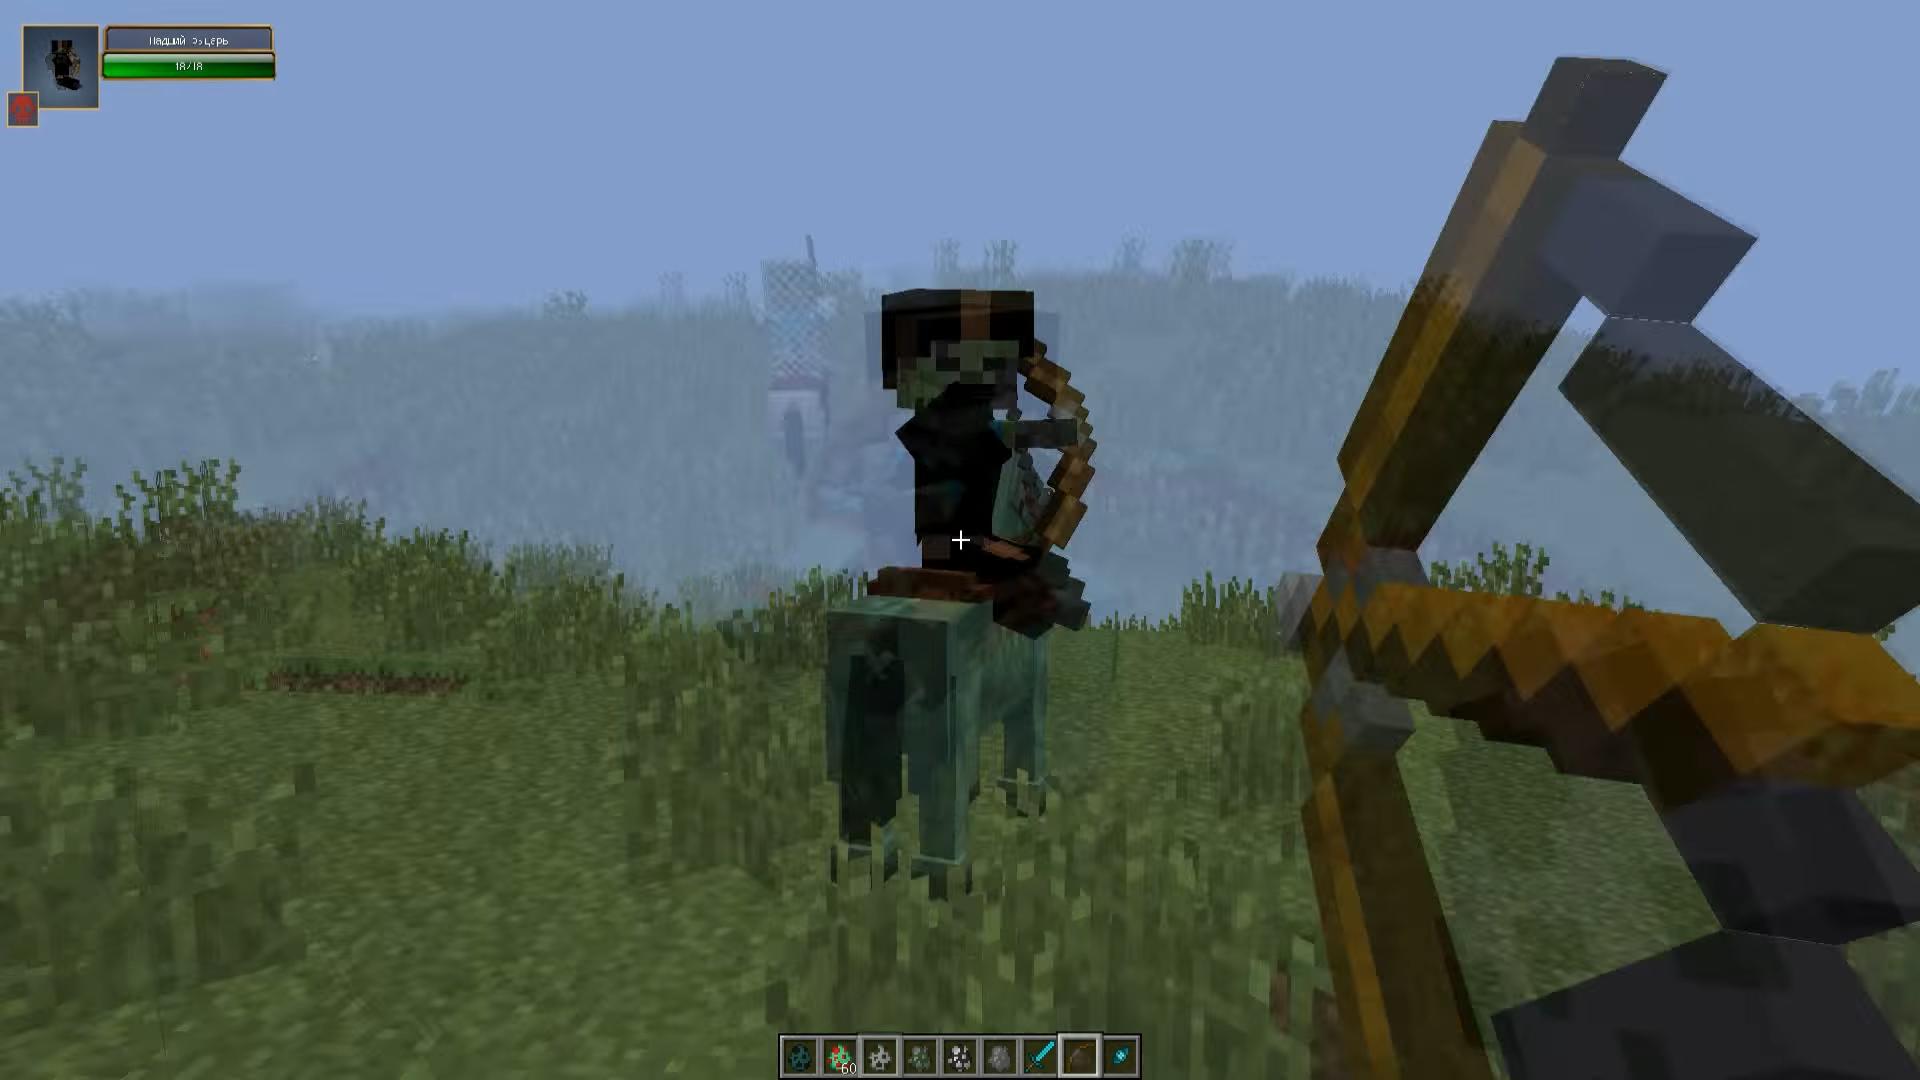 Мод Ender Zoo (Эндер-мобы) - скриншот 2